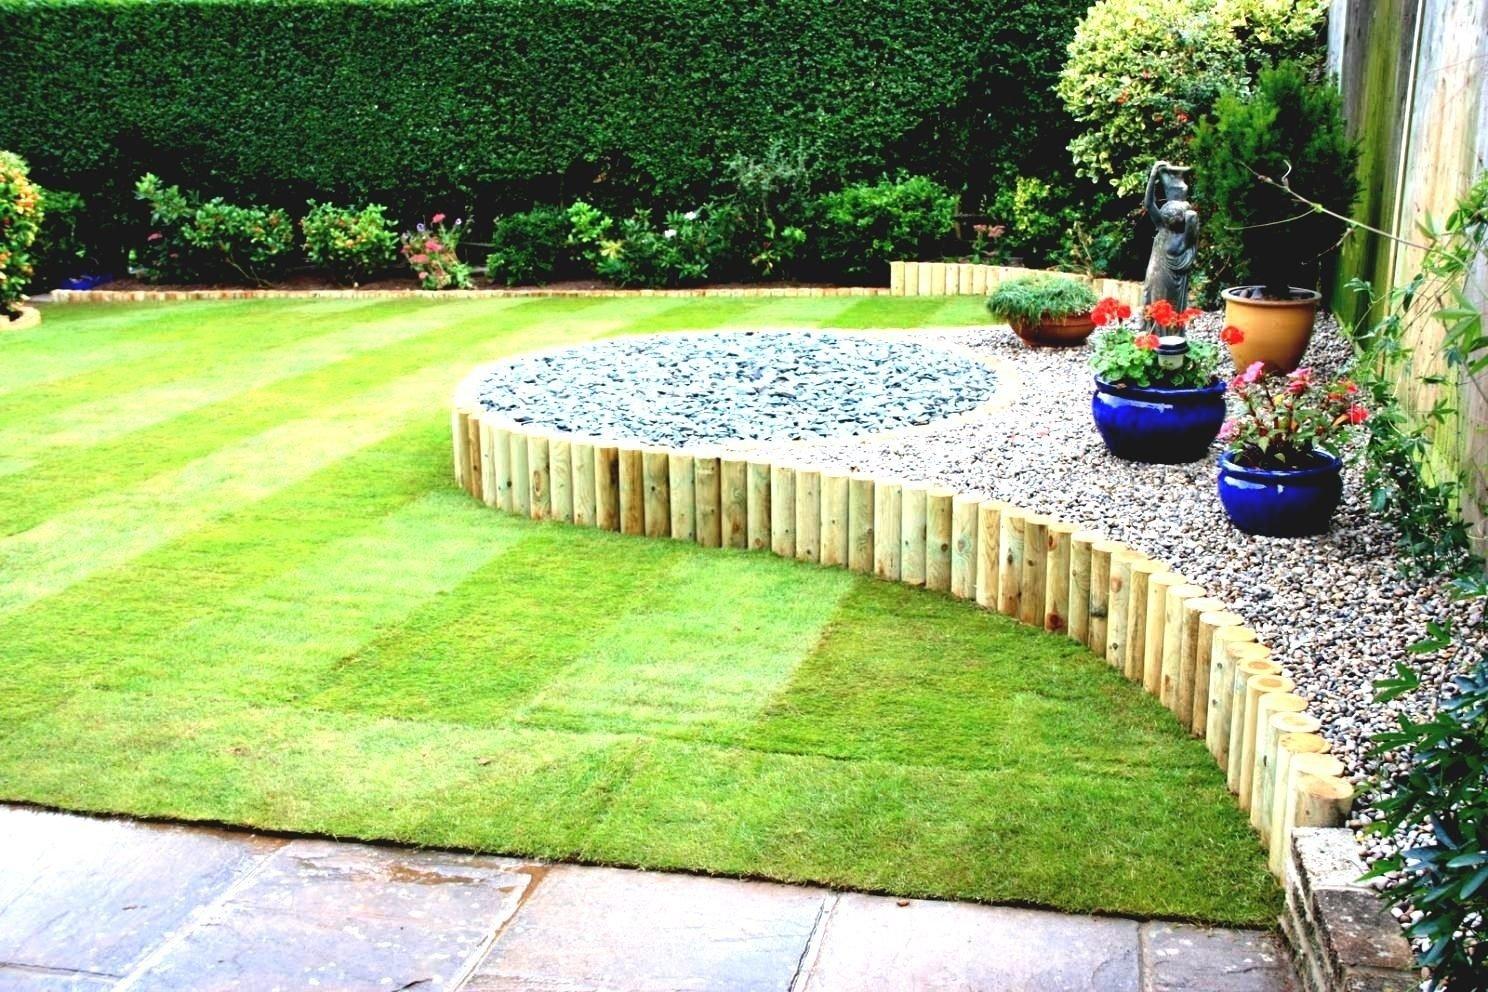 10 Cute Small Garden Ideas On A Budget back garden ideas on a budget uk design garden pinterest 2021